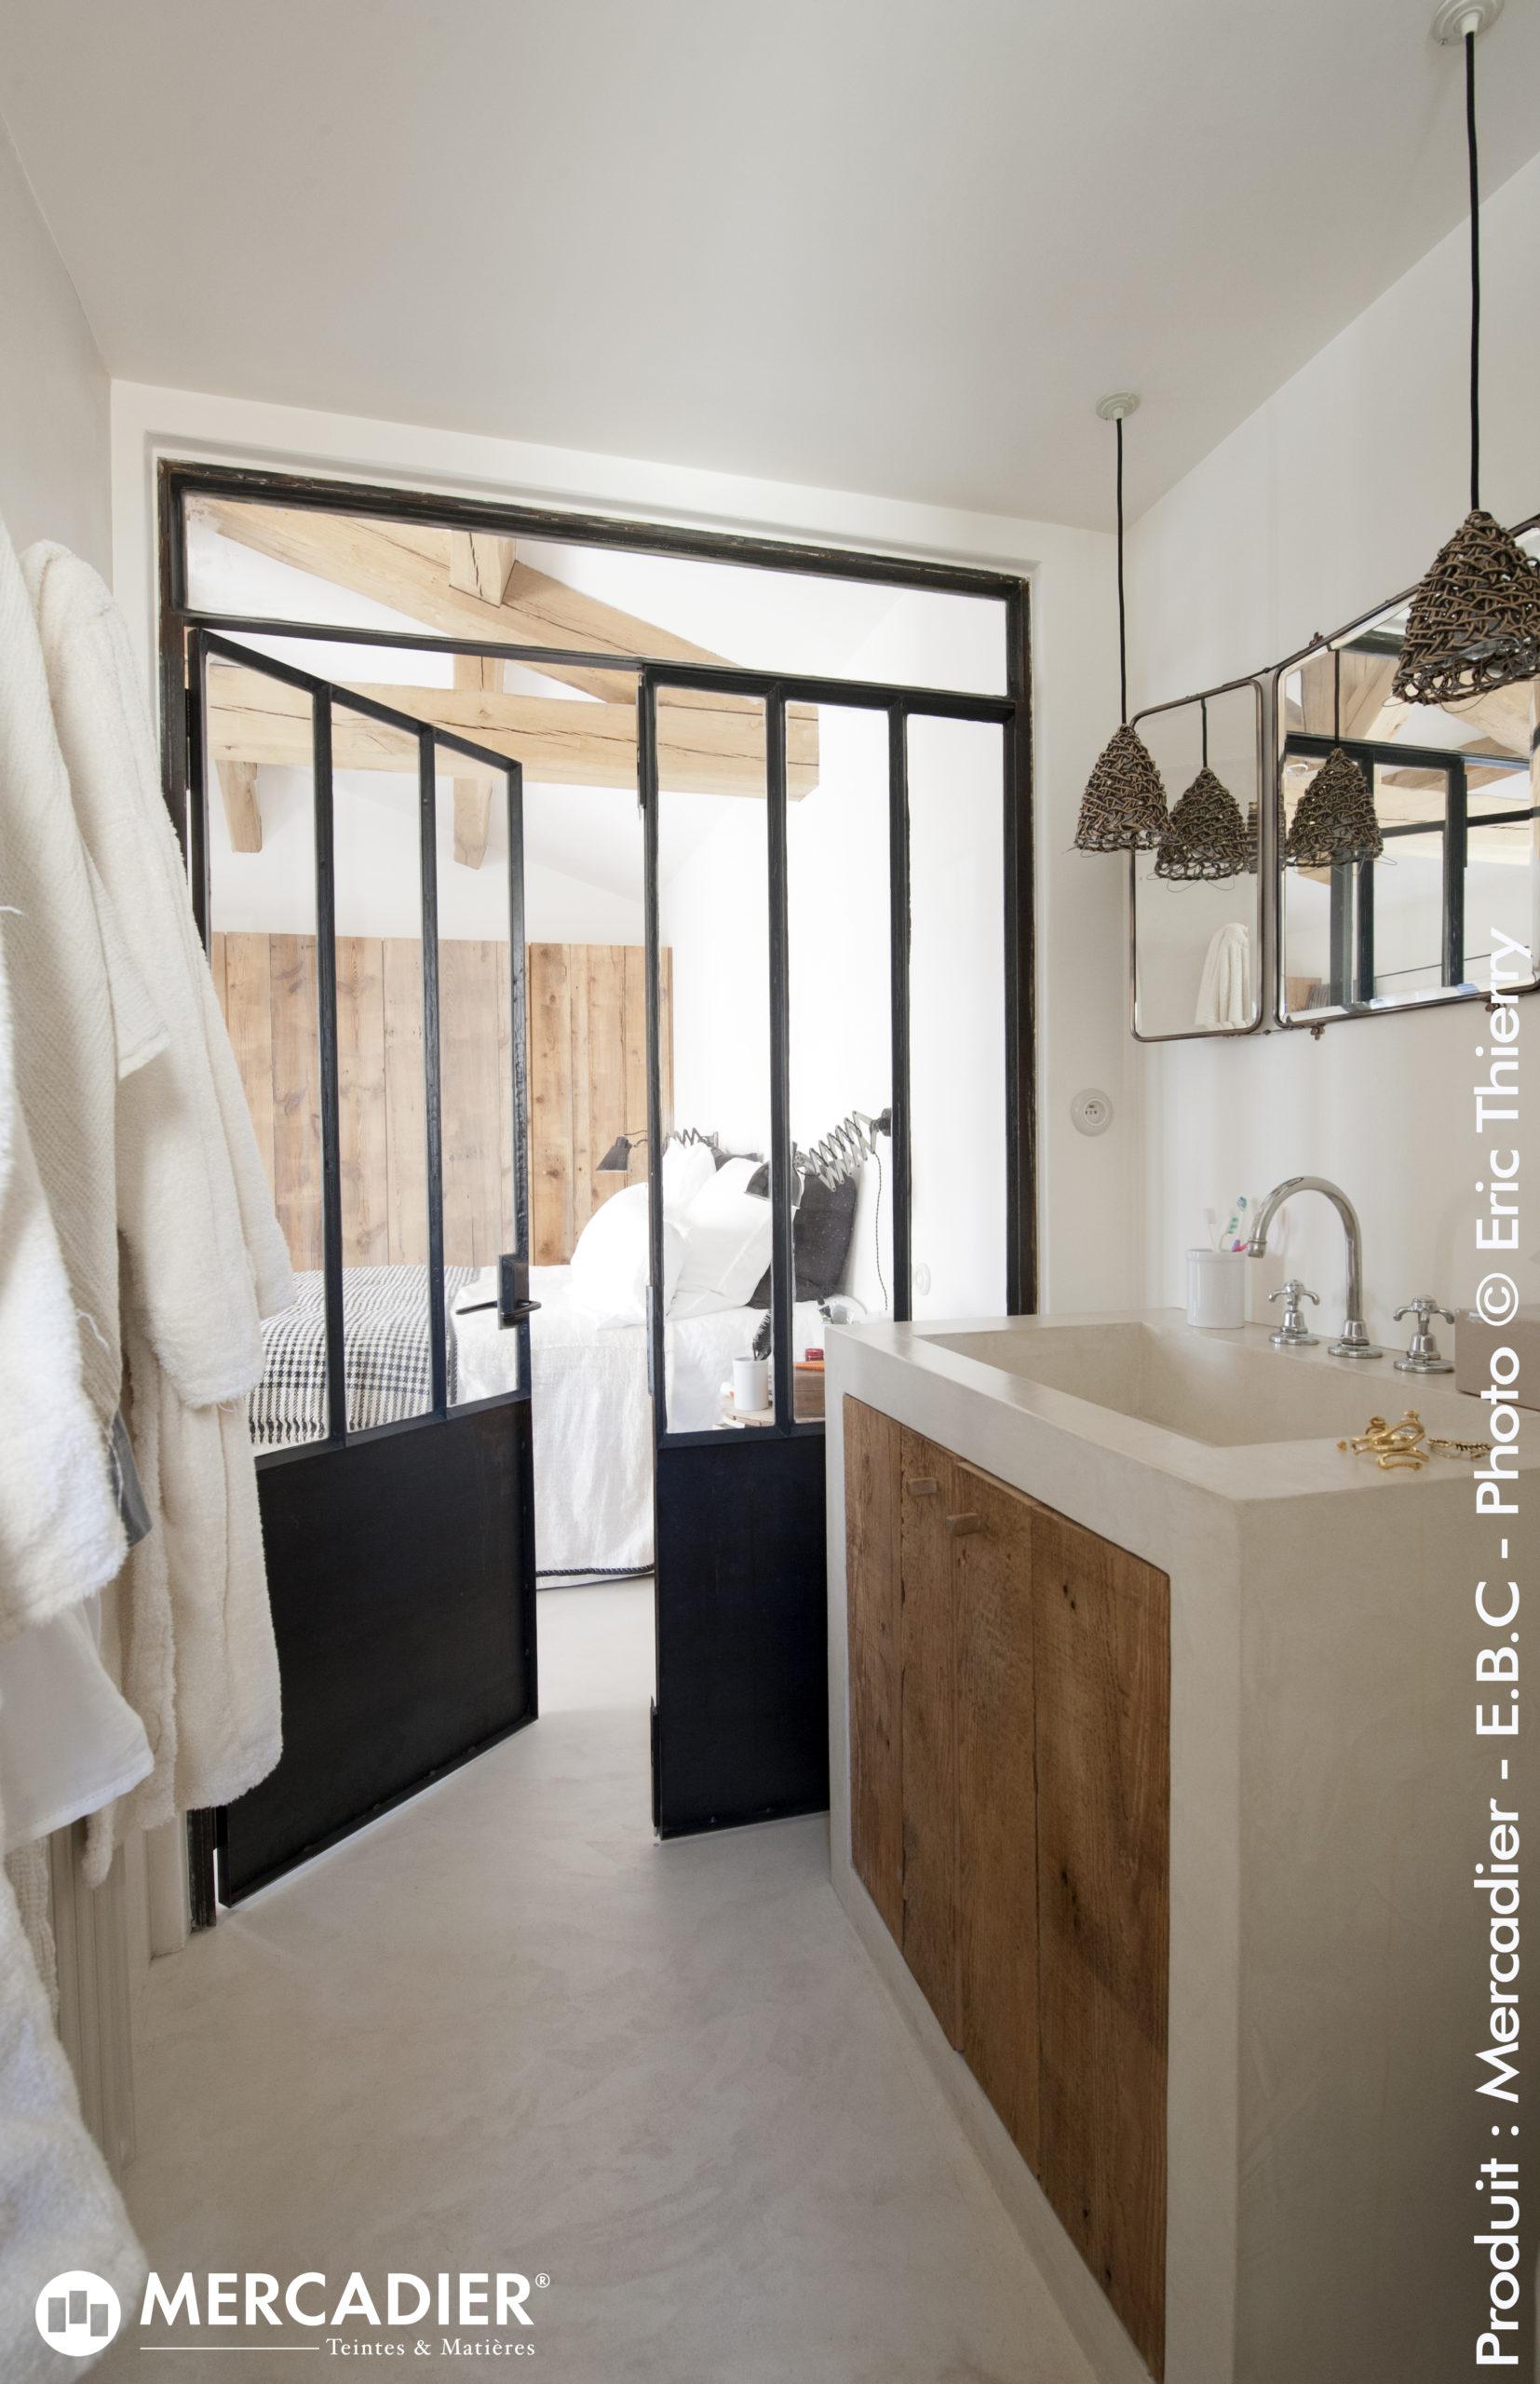 Sol et vasques de salle de bain en béton ciré blanc coco milk